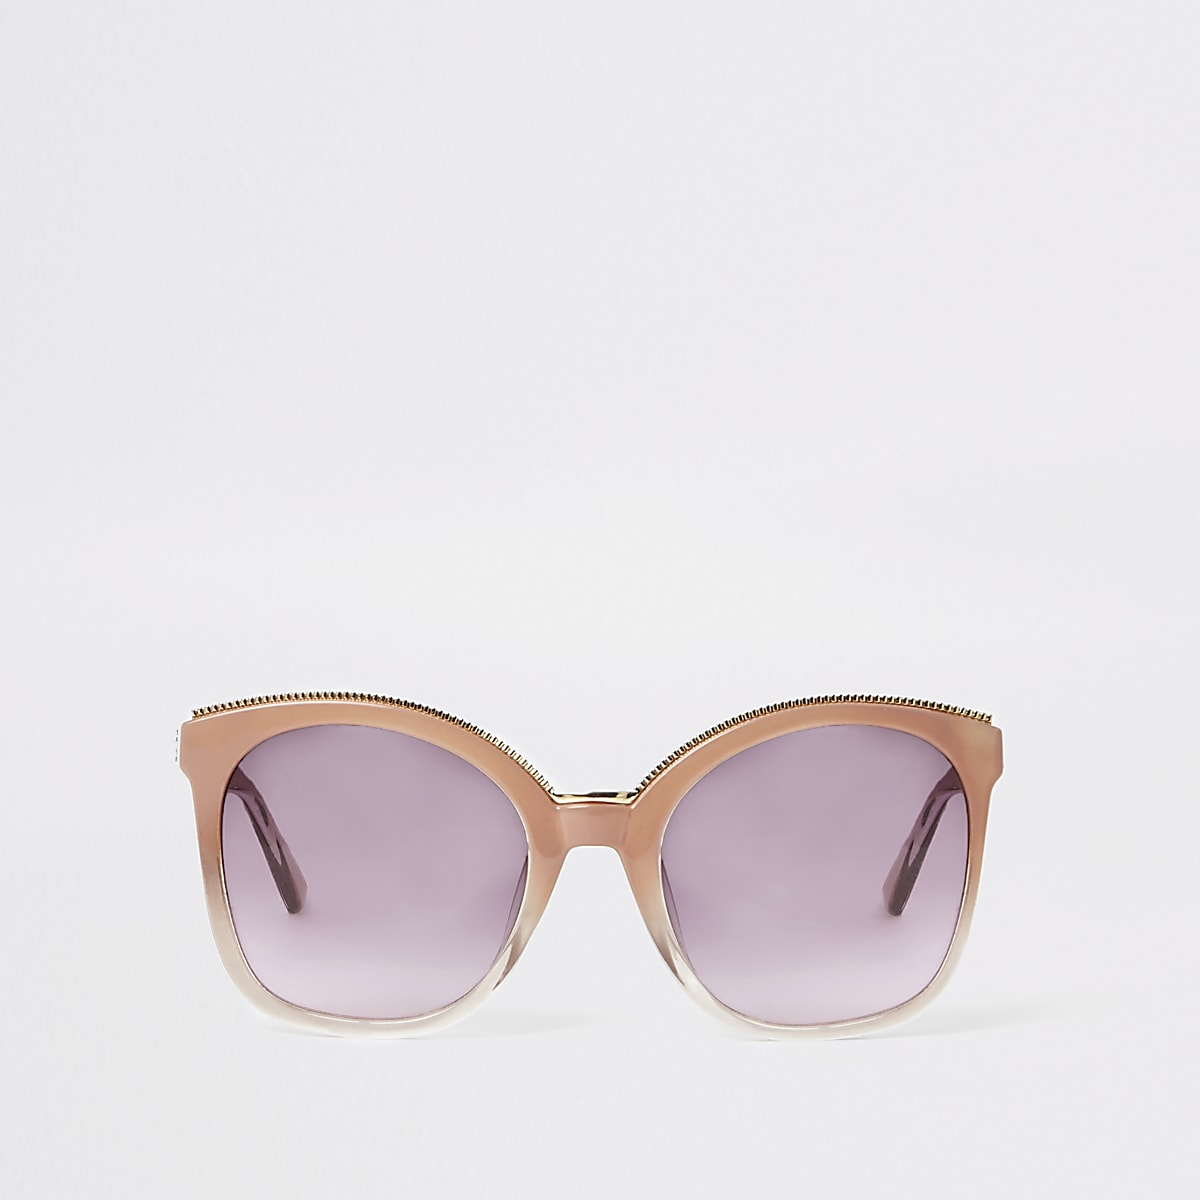 Pink oversized glam sunglasses